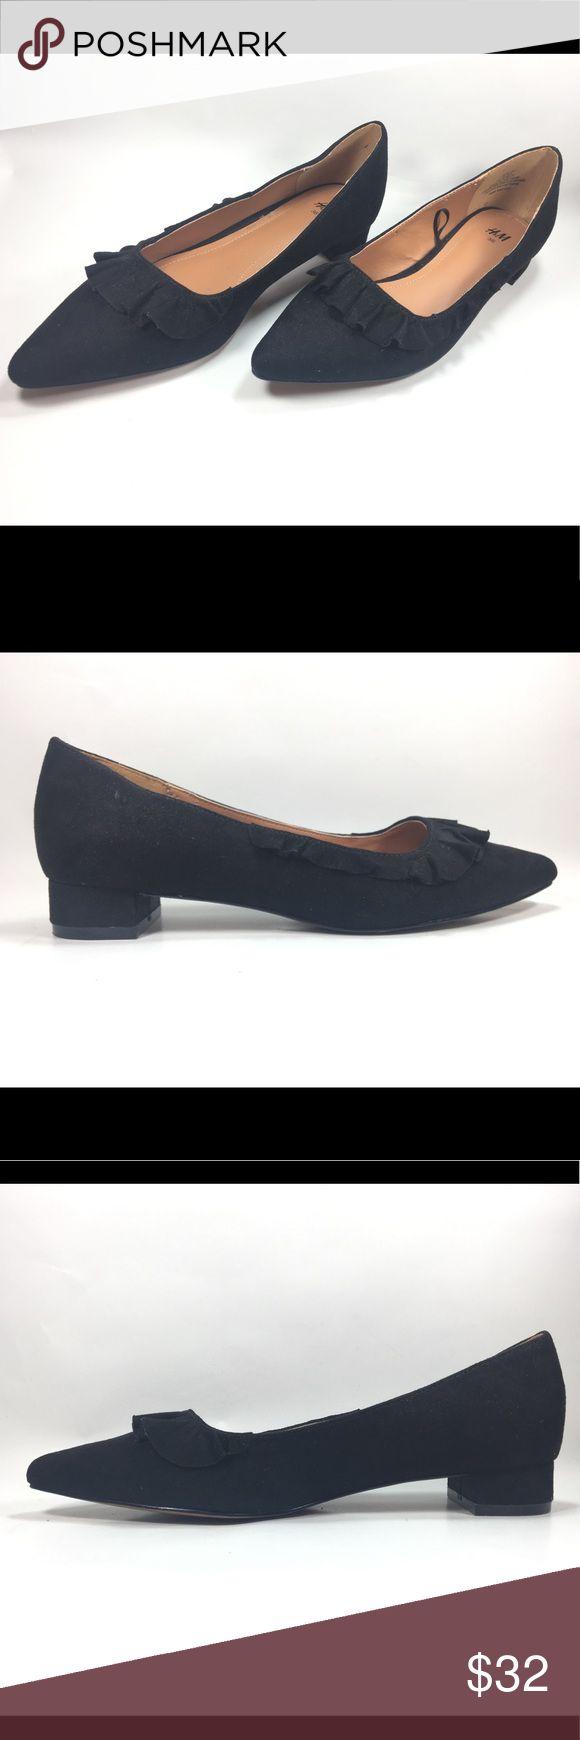 H&M Black Faux Suede Ballerina Pumps Size 5.5 Excellent Condition. Normal Wear To Sole/Heal. H&M Black Faux Suede Pointy Toe Low Block Heel Ballerina Pumps Size 5.5. Shoe #045 H&M Shoes Heels